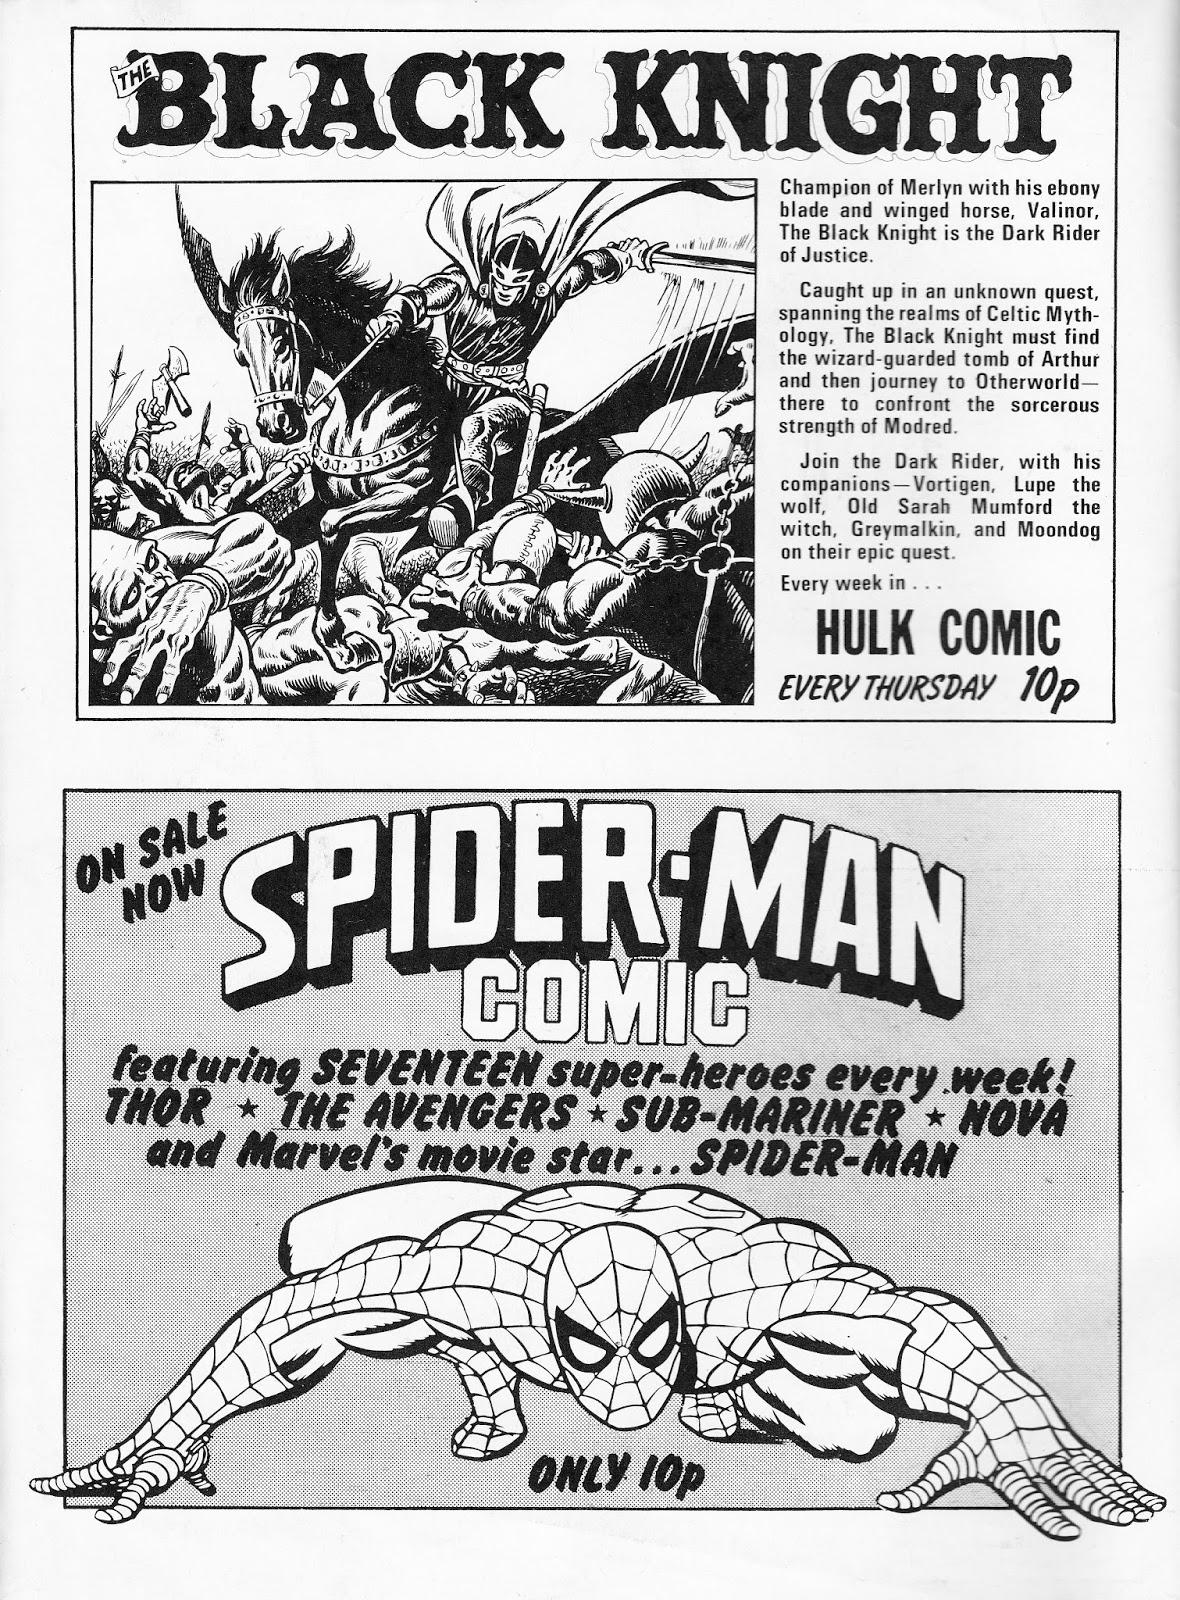 SPIDER-MAN HOUSE AD